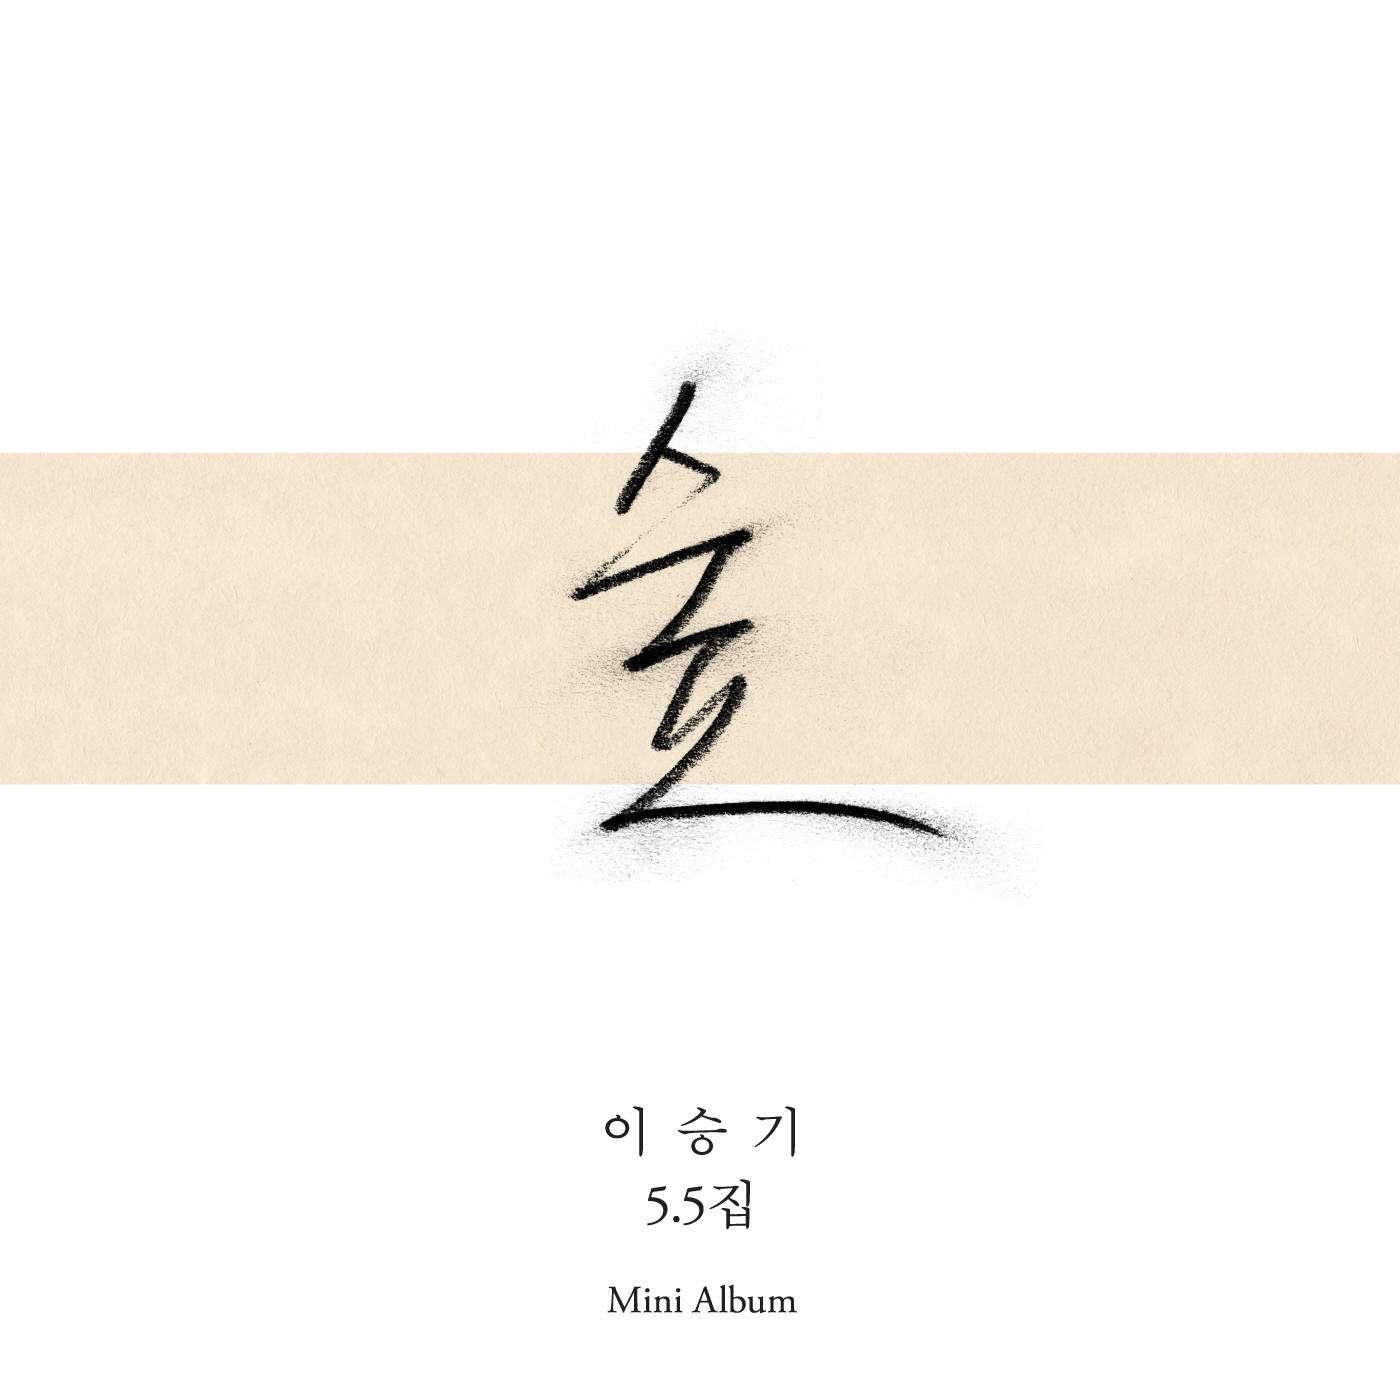 [Mini Album] Lee Seung Gi - Forest